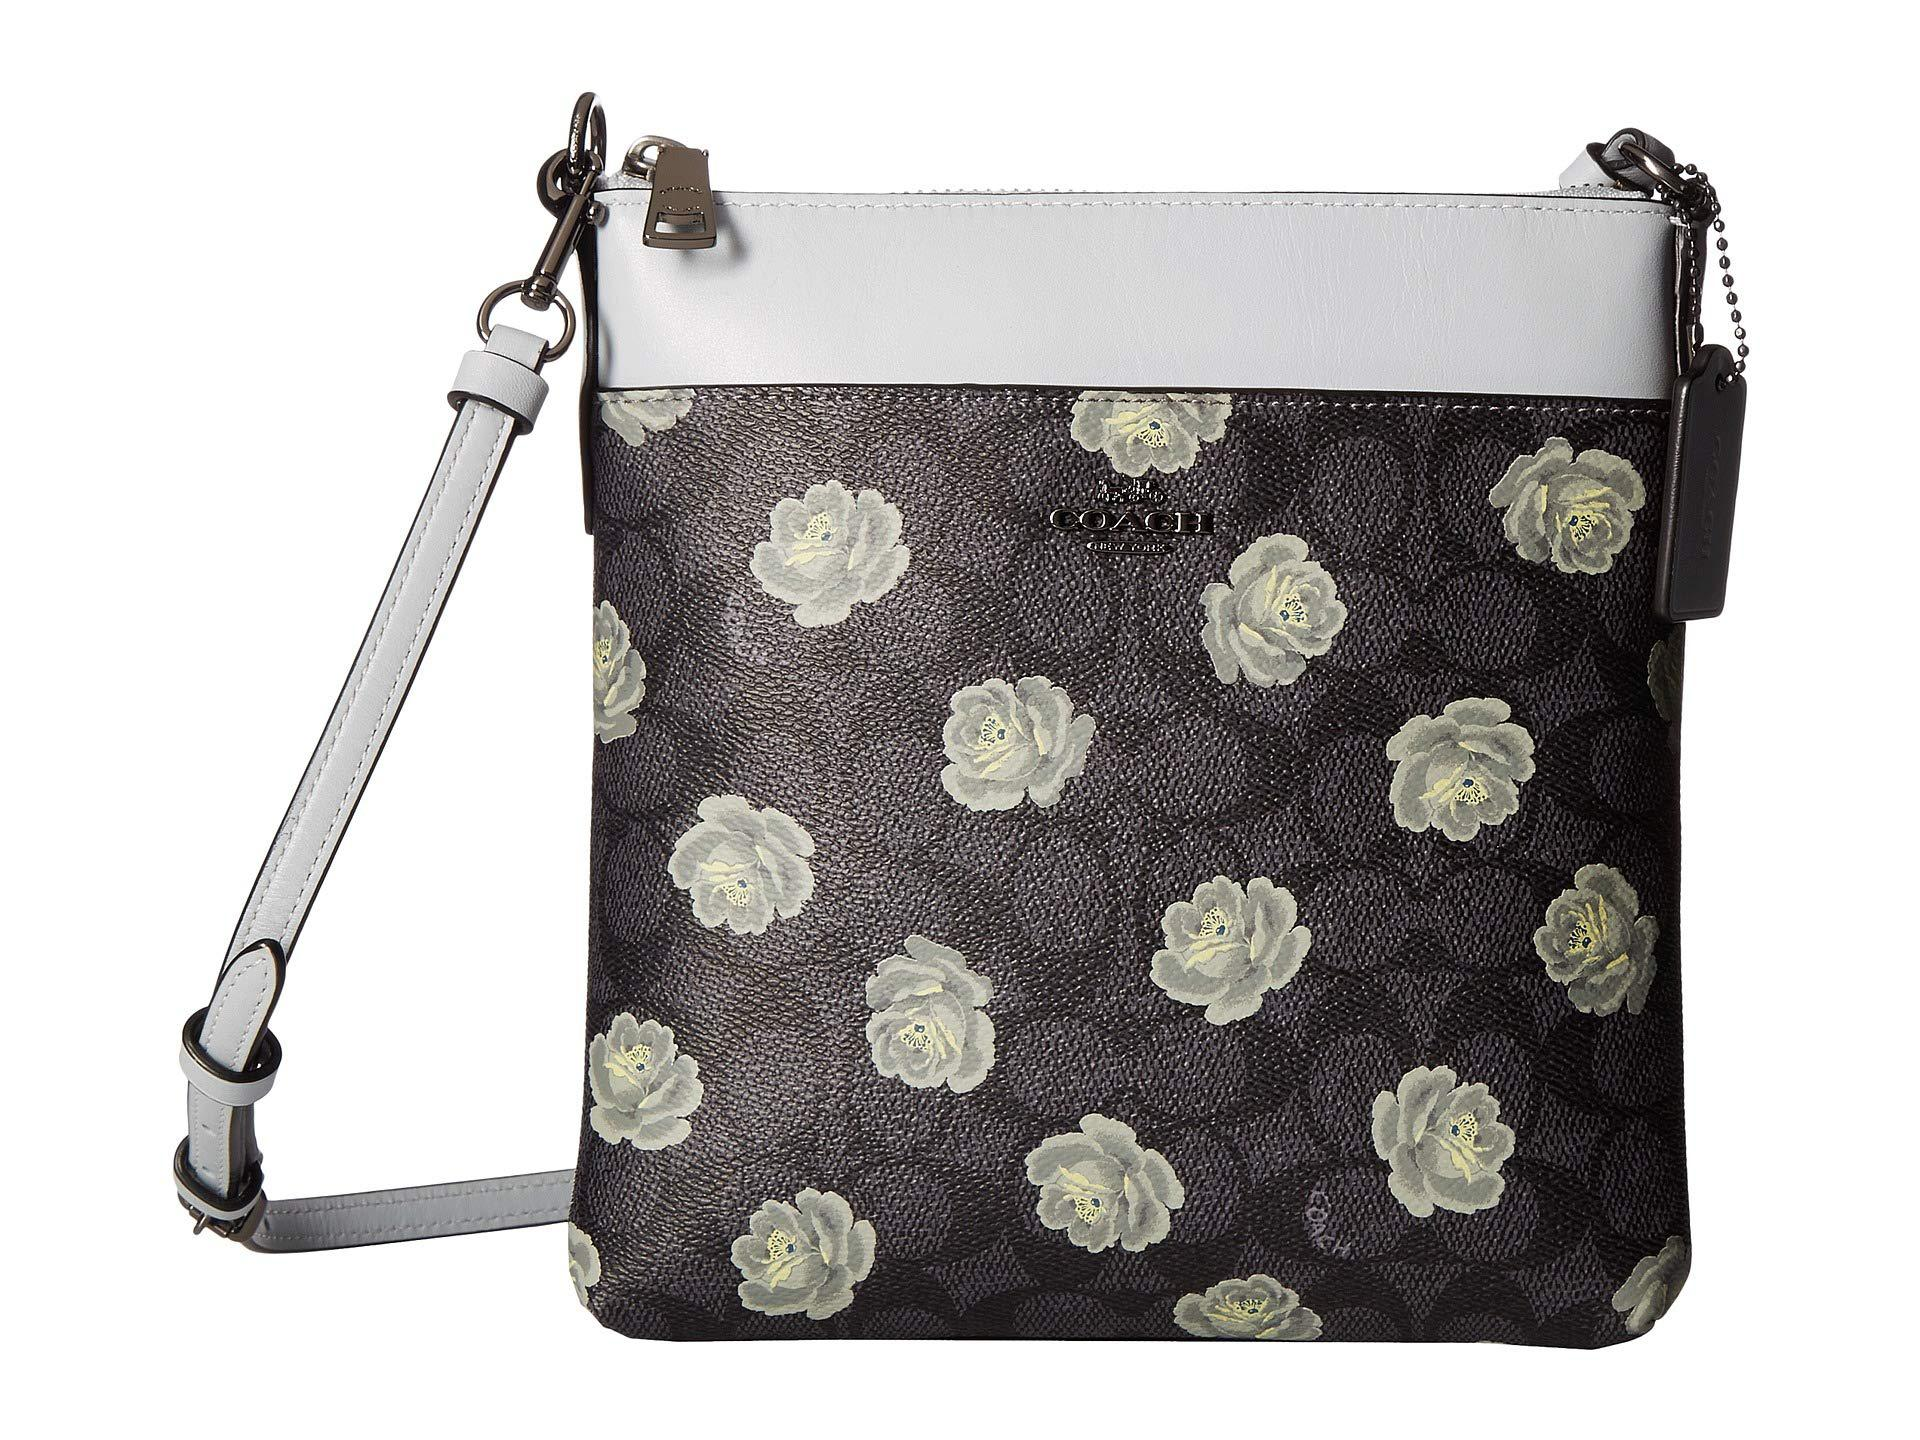 63e3d99a51e8 COACH. Women s Messenger Crossbody In Coated Canvas Signature With Print  (b4 tan) Cross Body Handbags